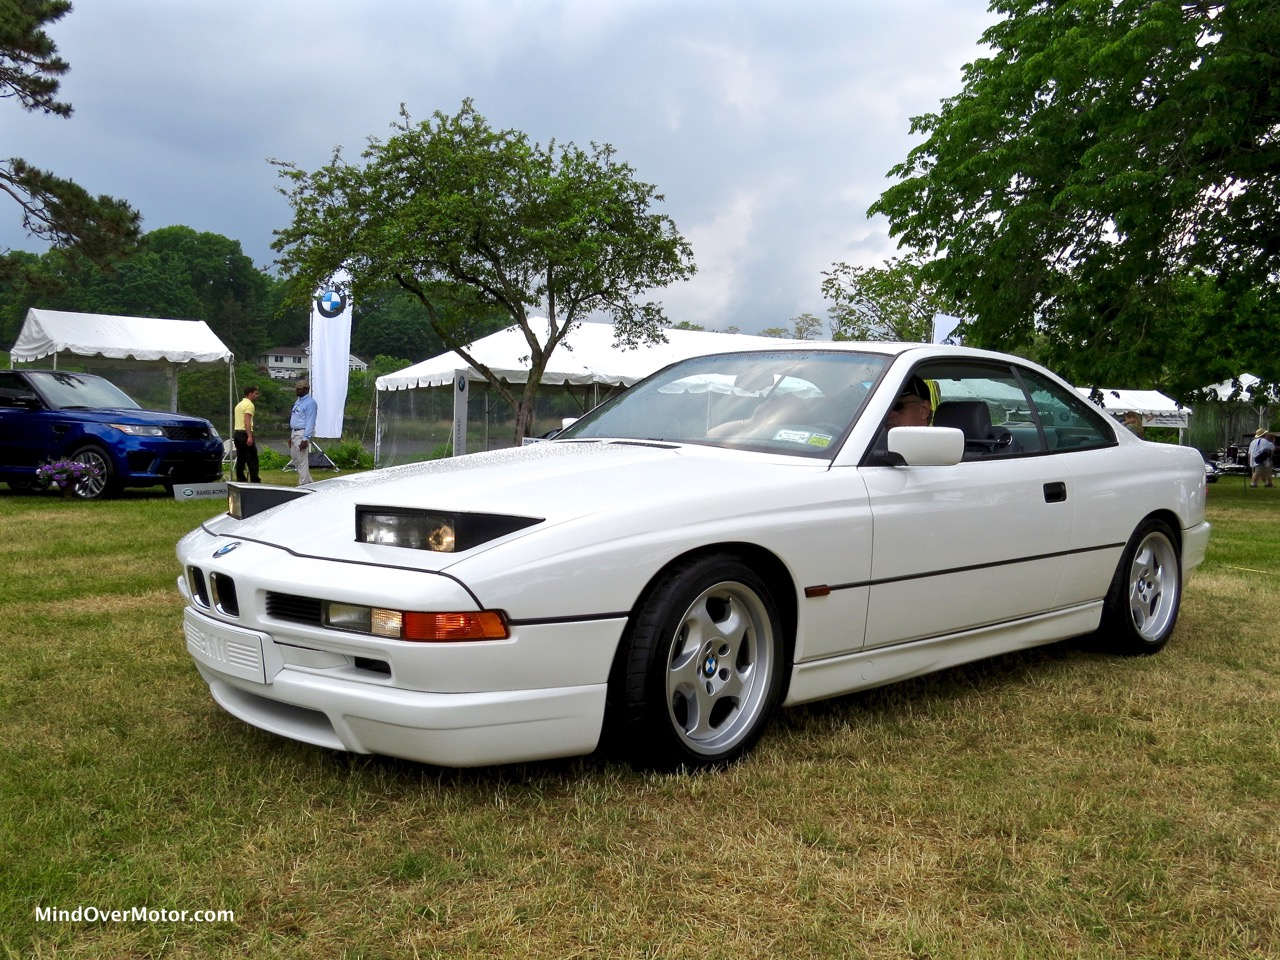 BMW 850CSi Headlights Up Front